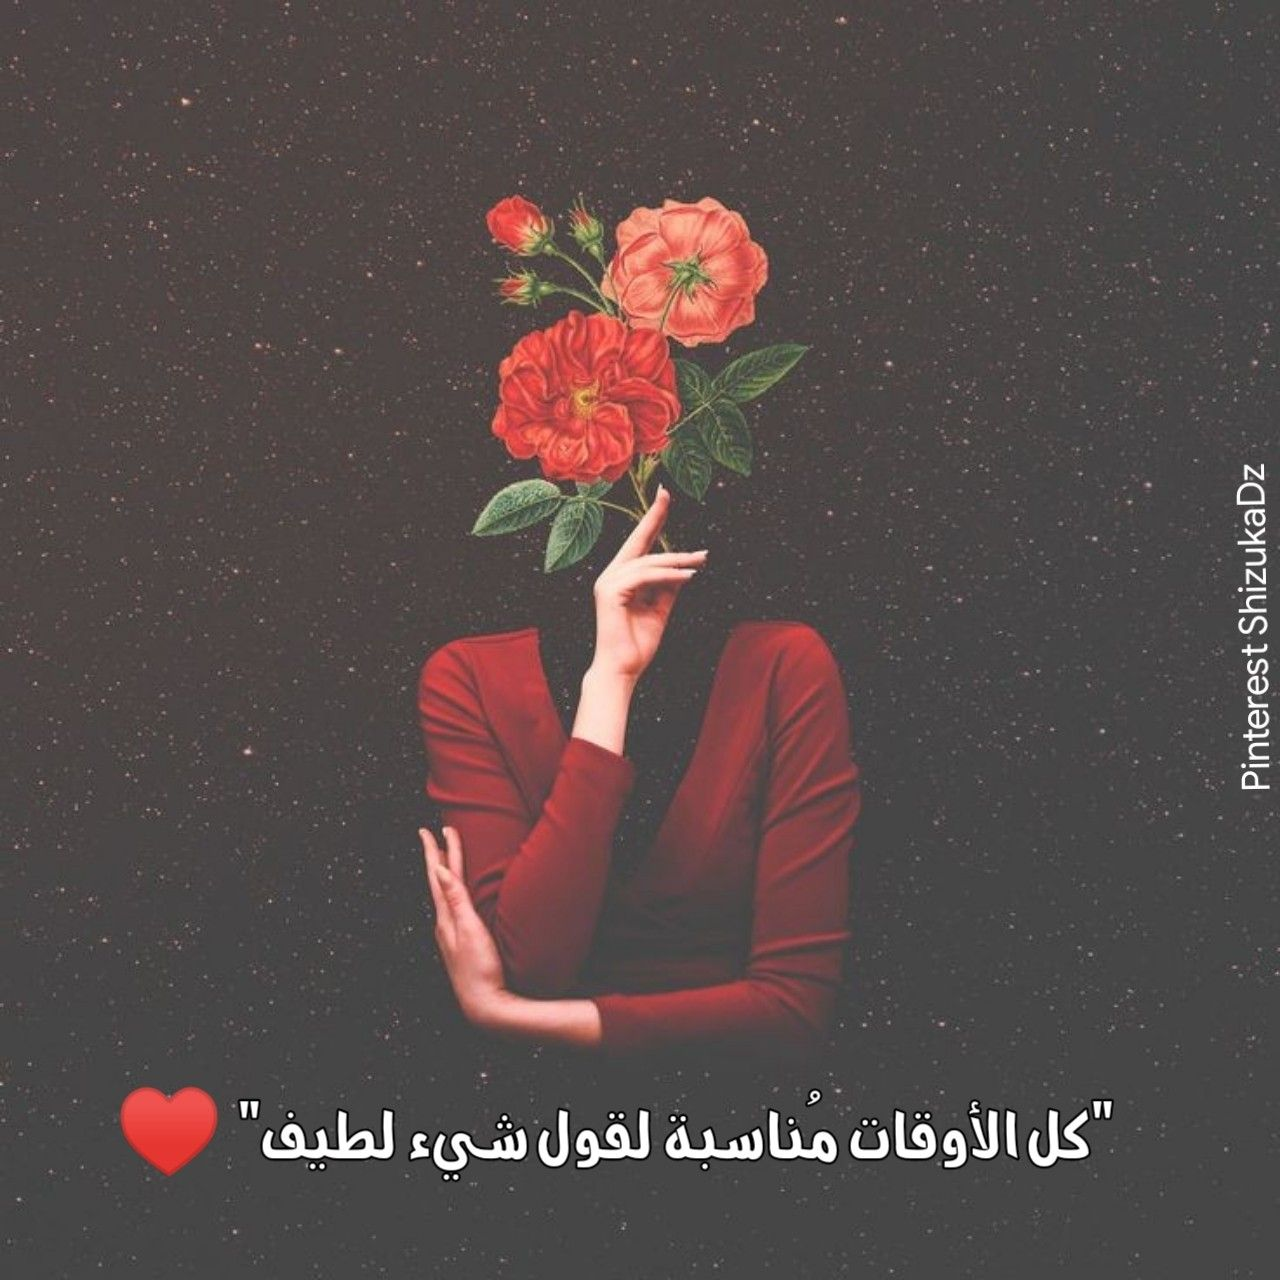 كل الأوقات م ـناسبة لقول شيء لطيف Saving Quotes Beautiful Quotes Love Quotes Poetry